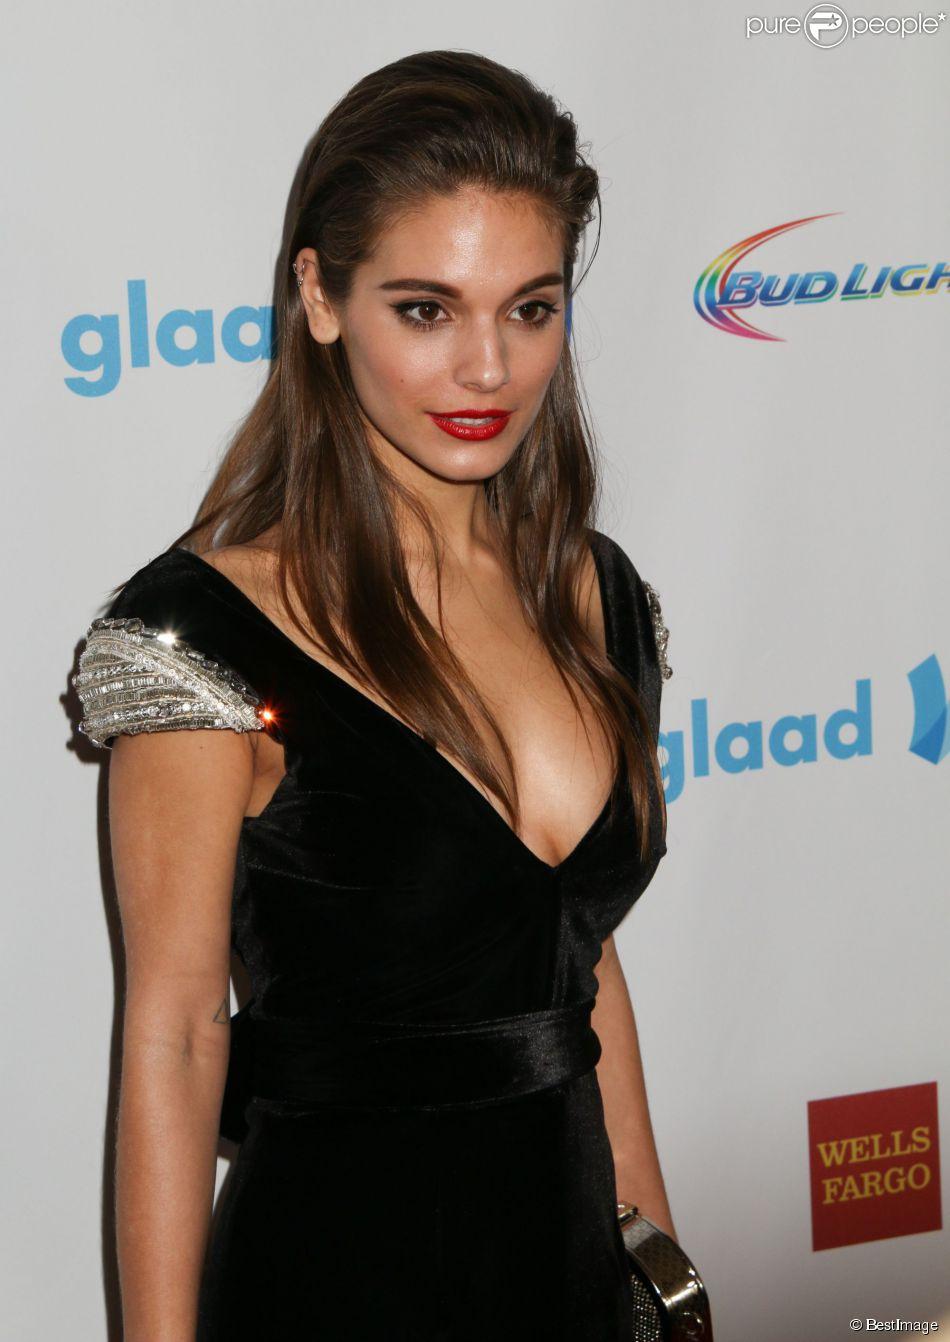 Caitlin Stasey - 25e édition des GLAAD Media Awards à Los Angeles le 12 avril 2014